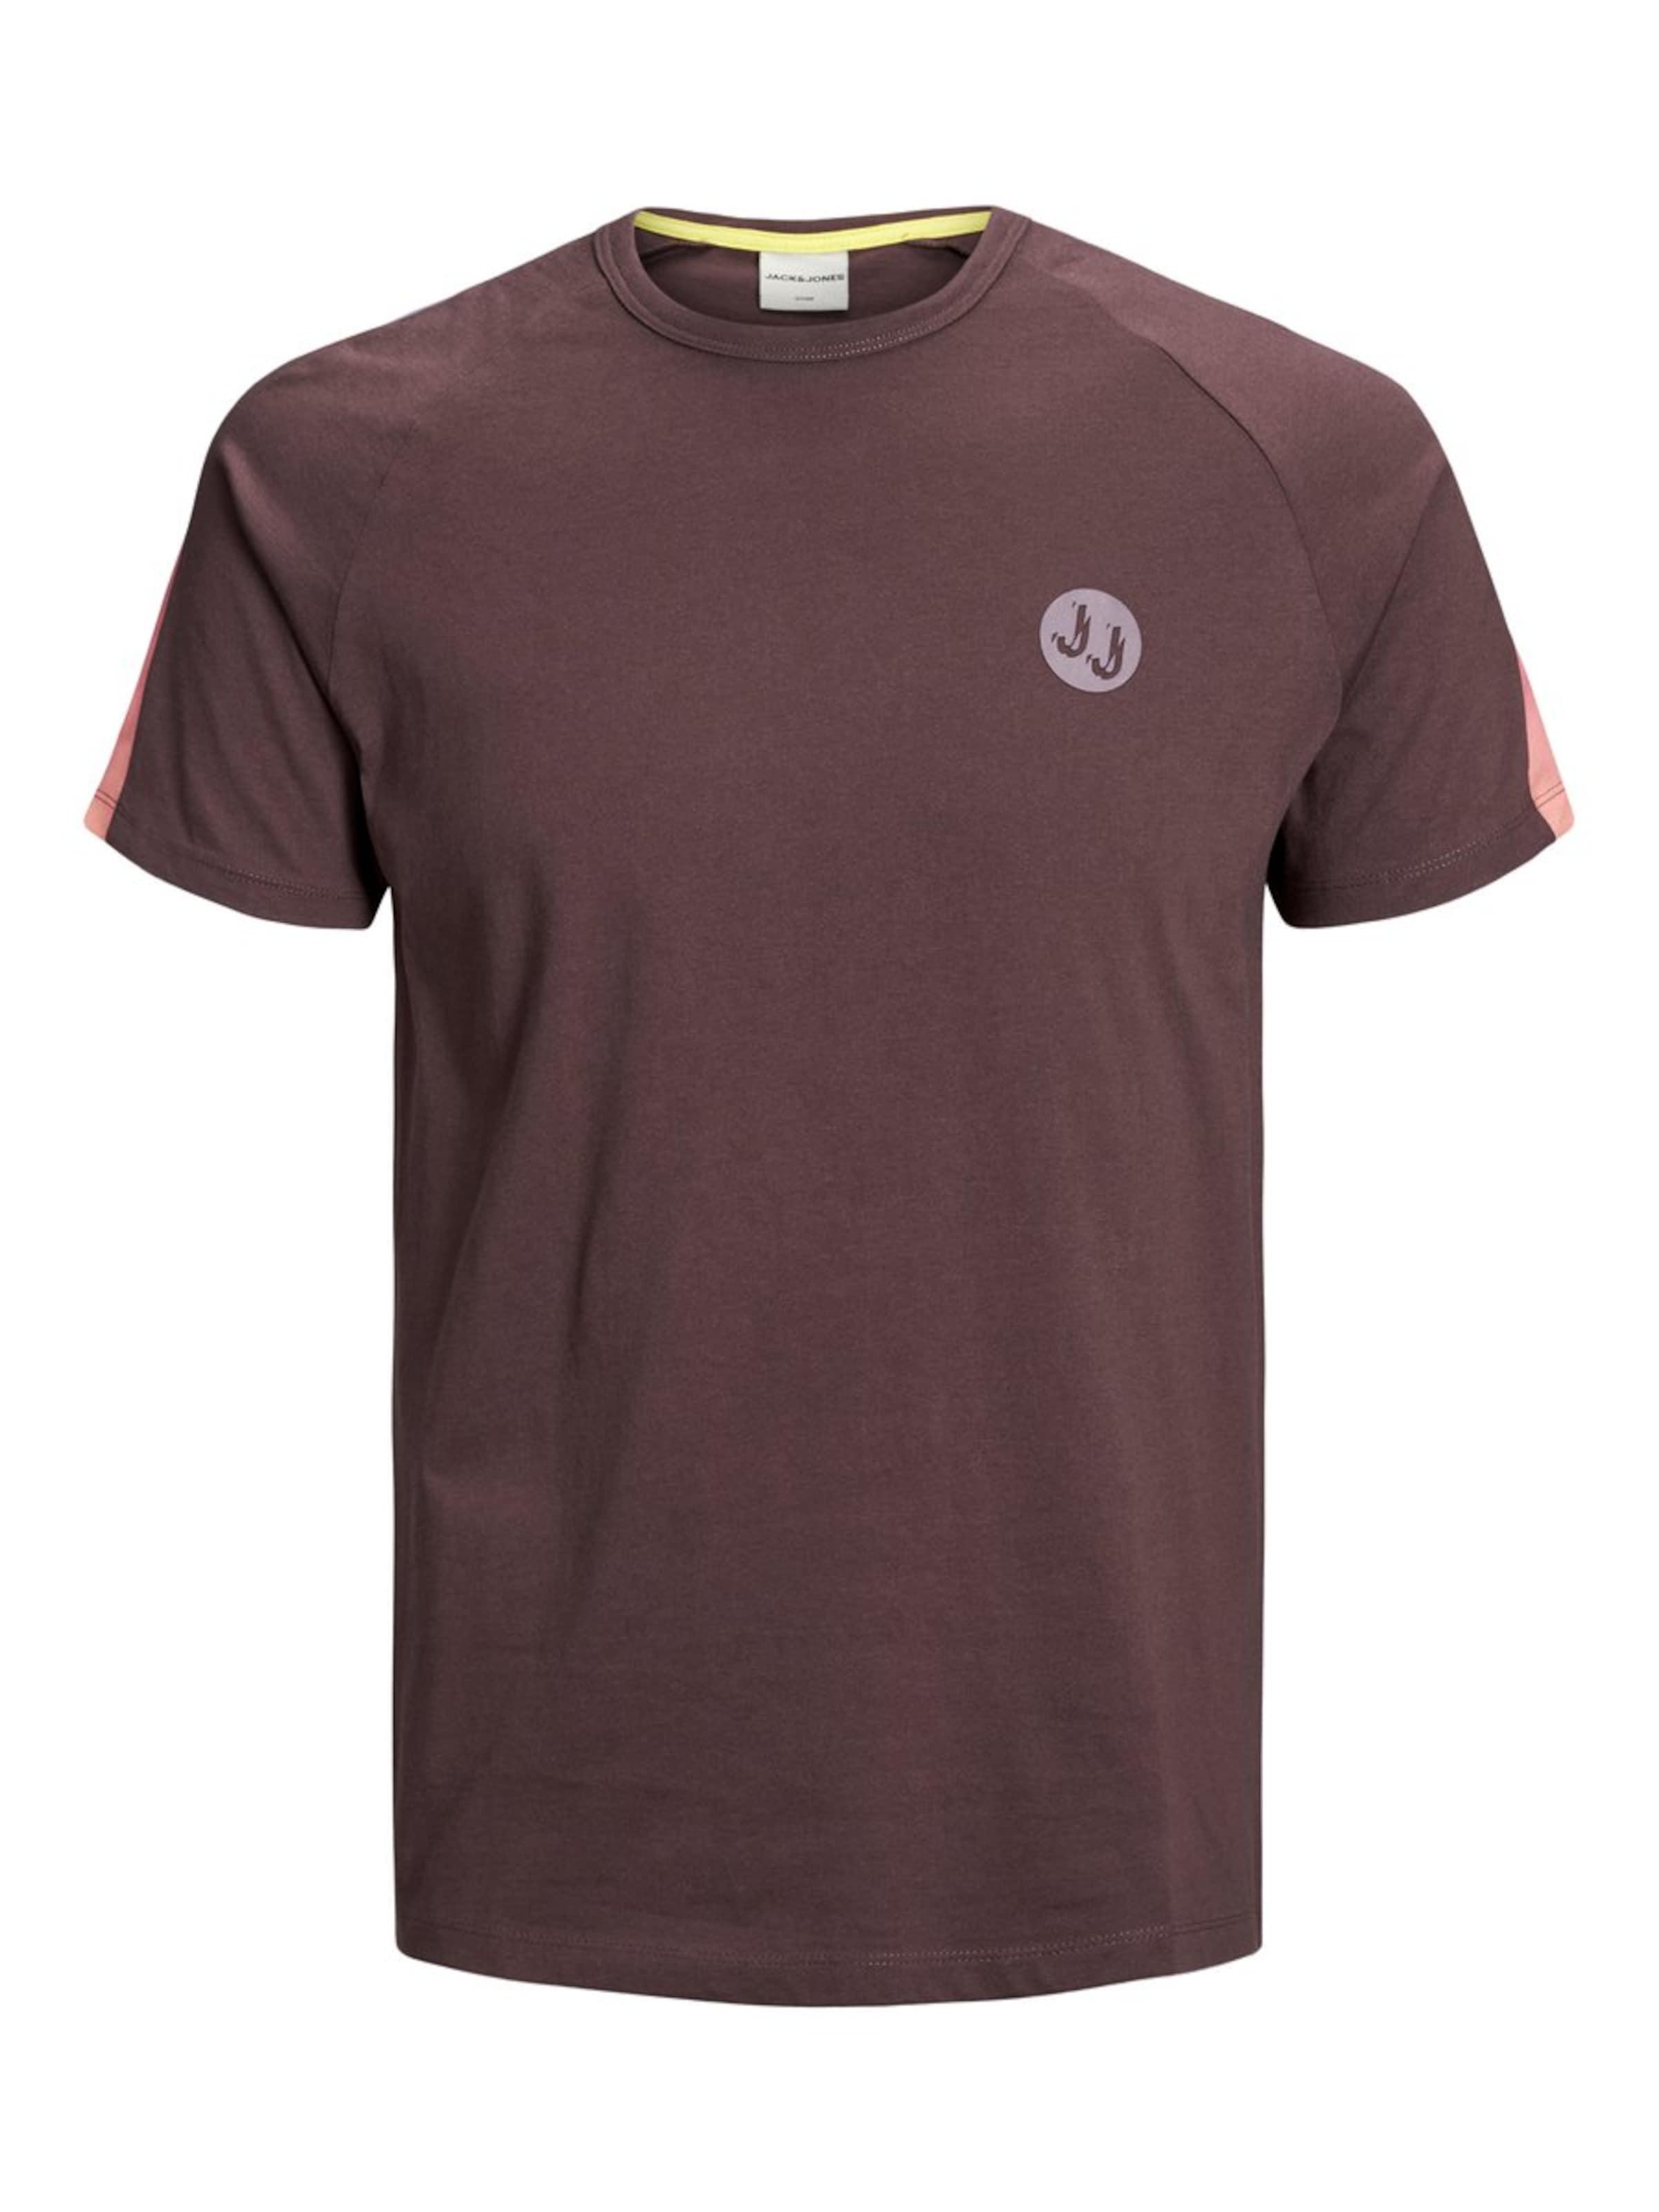 T Bordeaux En Jones Jackamp; shirt ULqSjzVpMG